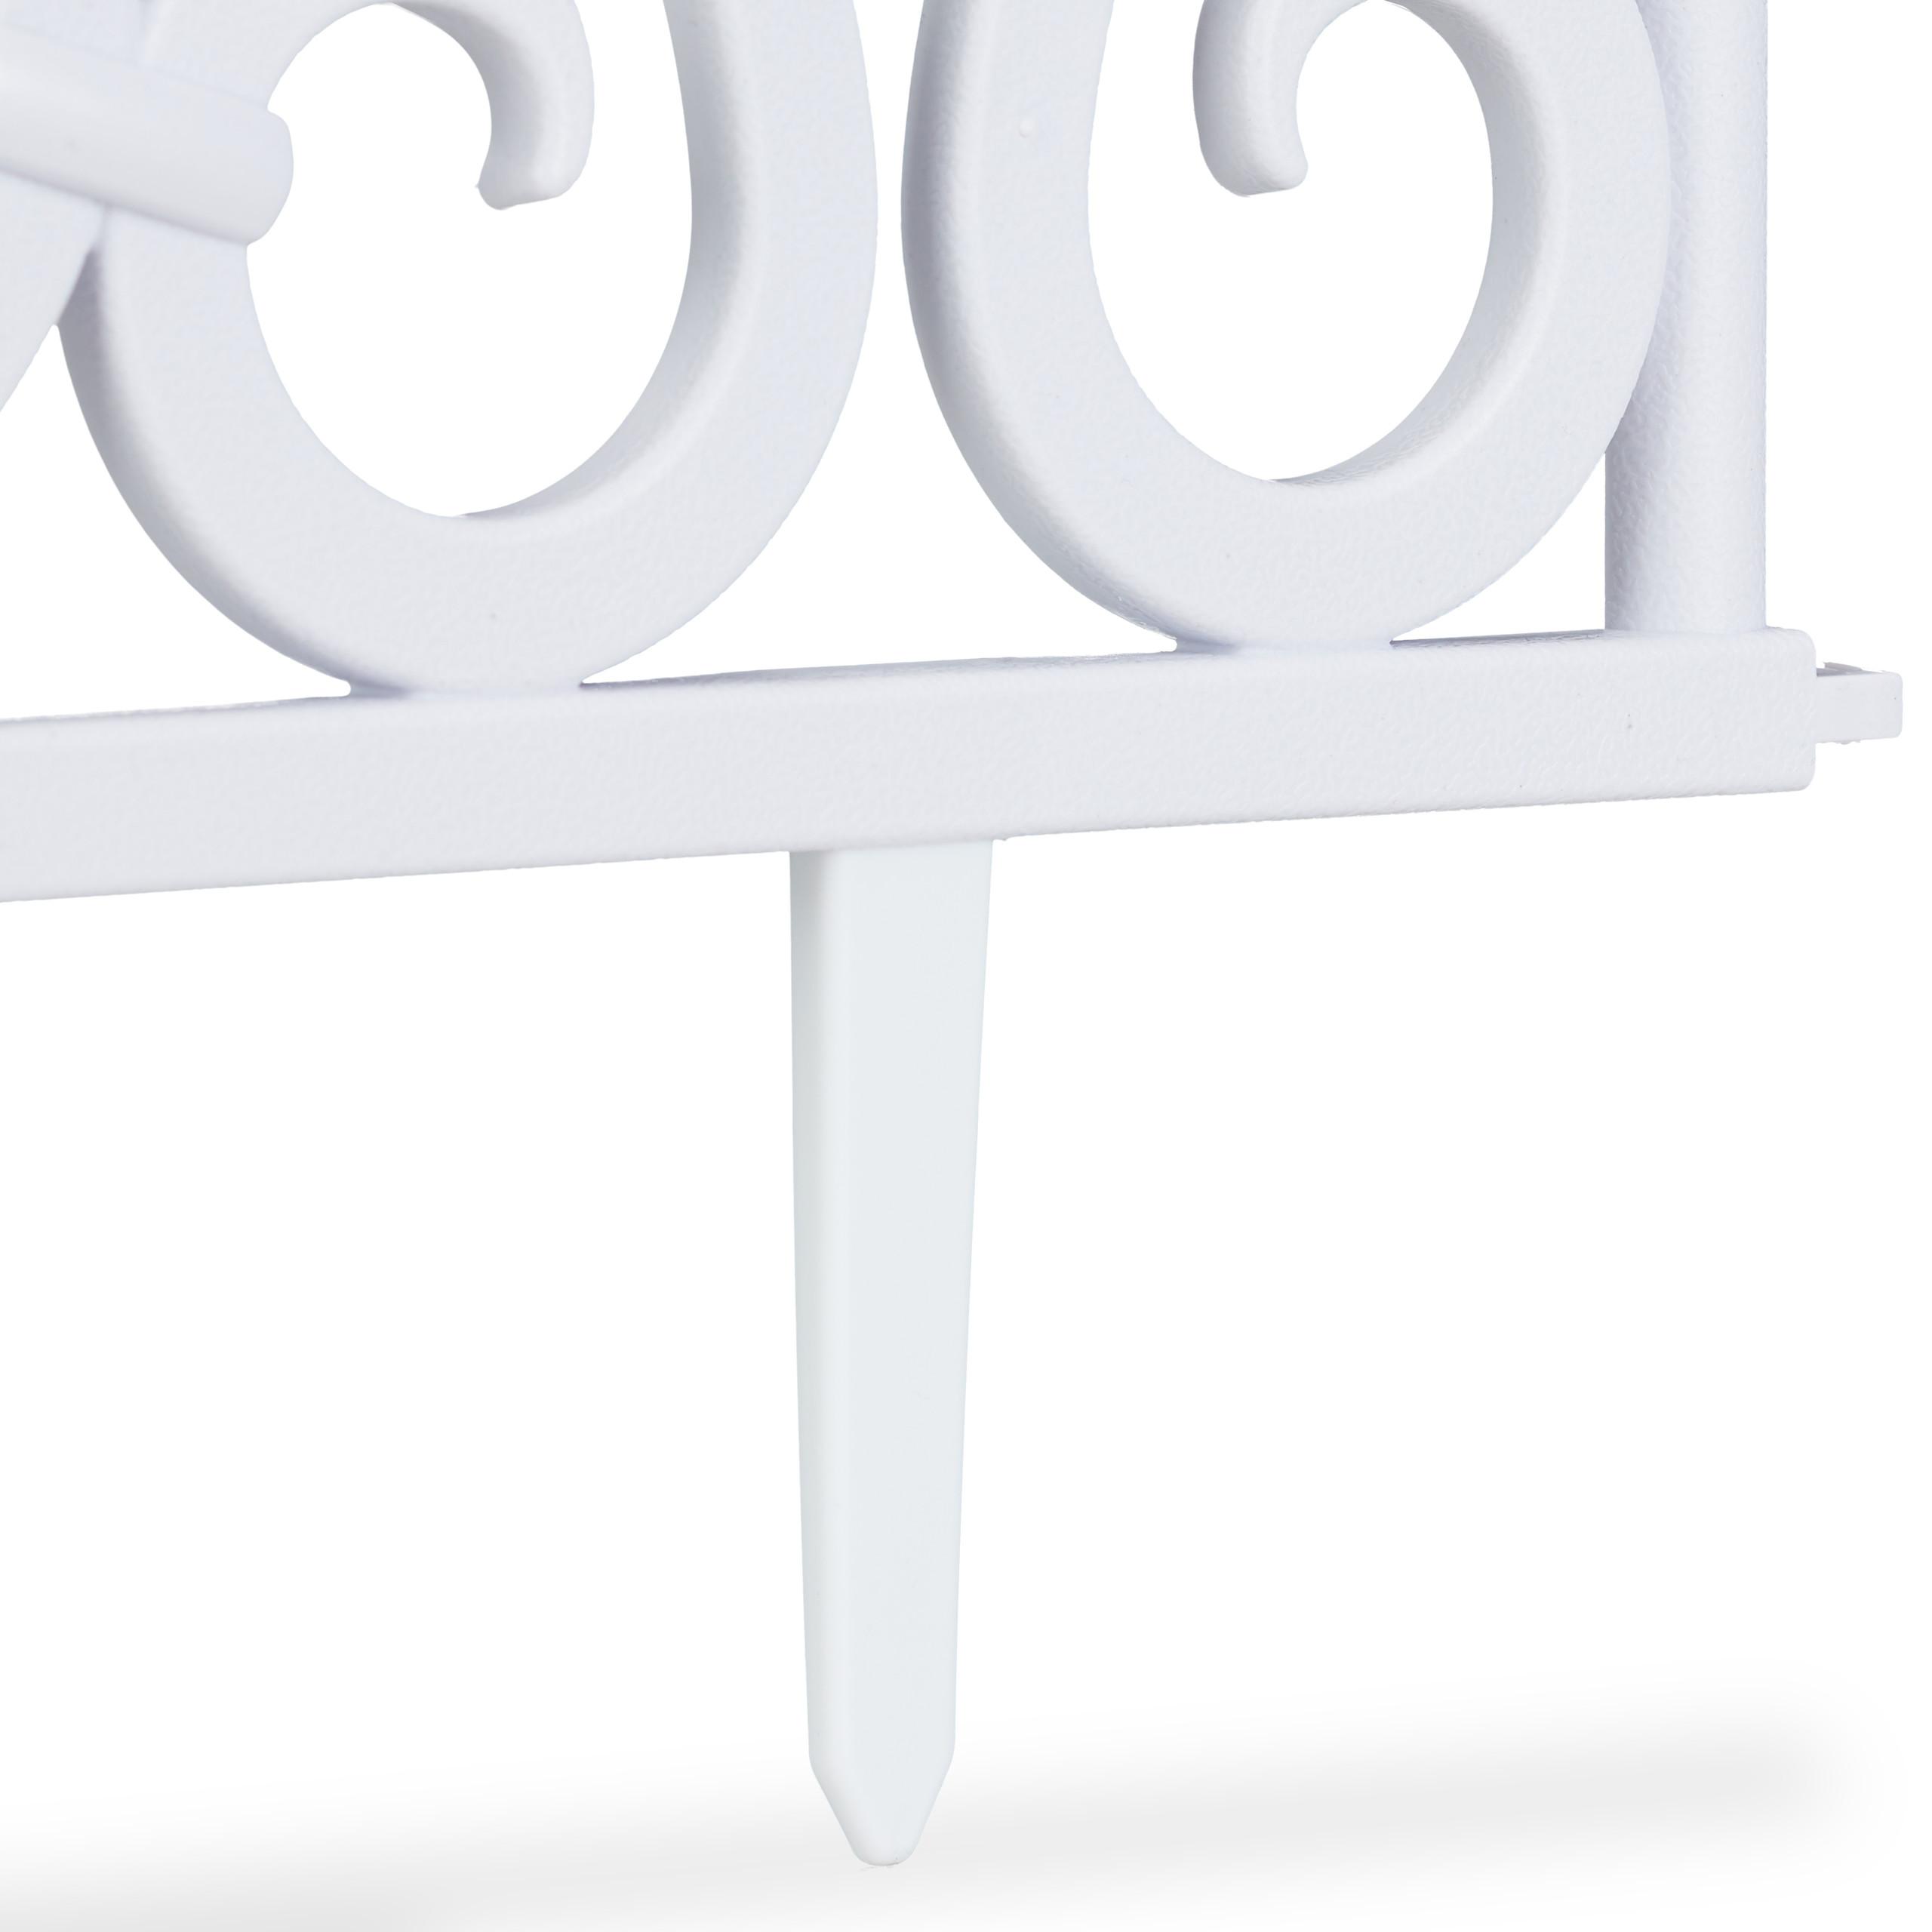 Valla-jardin-Borde-cesped-Bordillo-limitador-jardin-Set-4-separadores-cesped miniatura 8